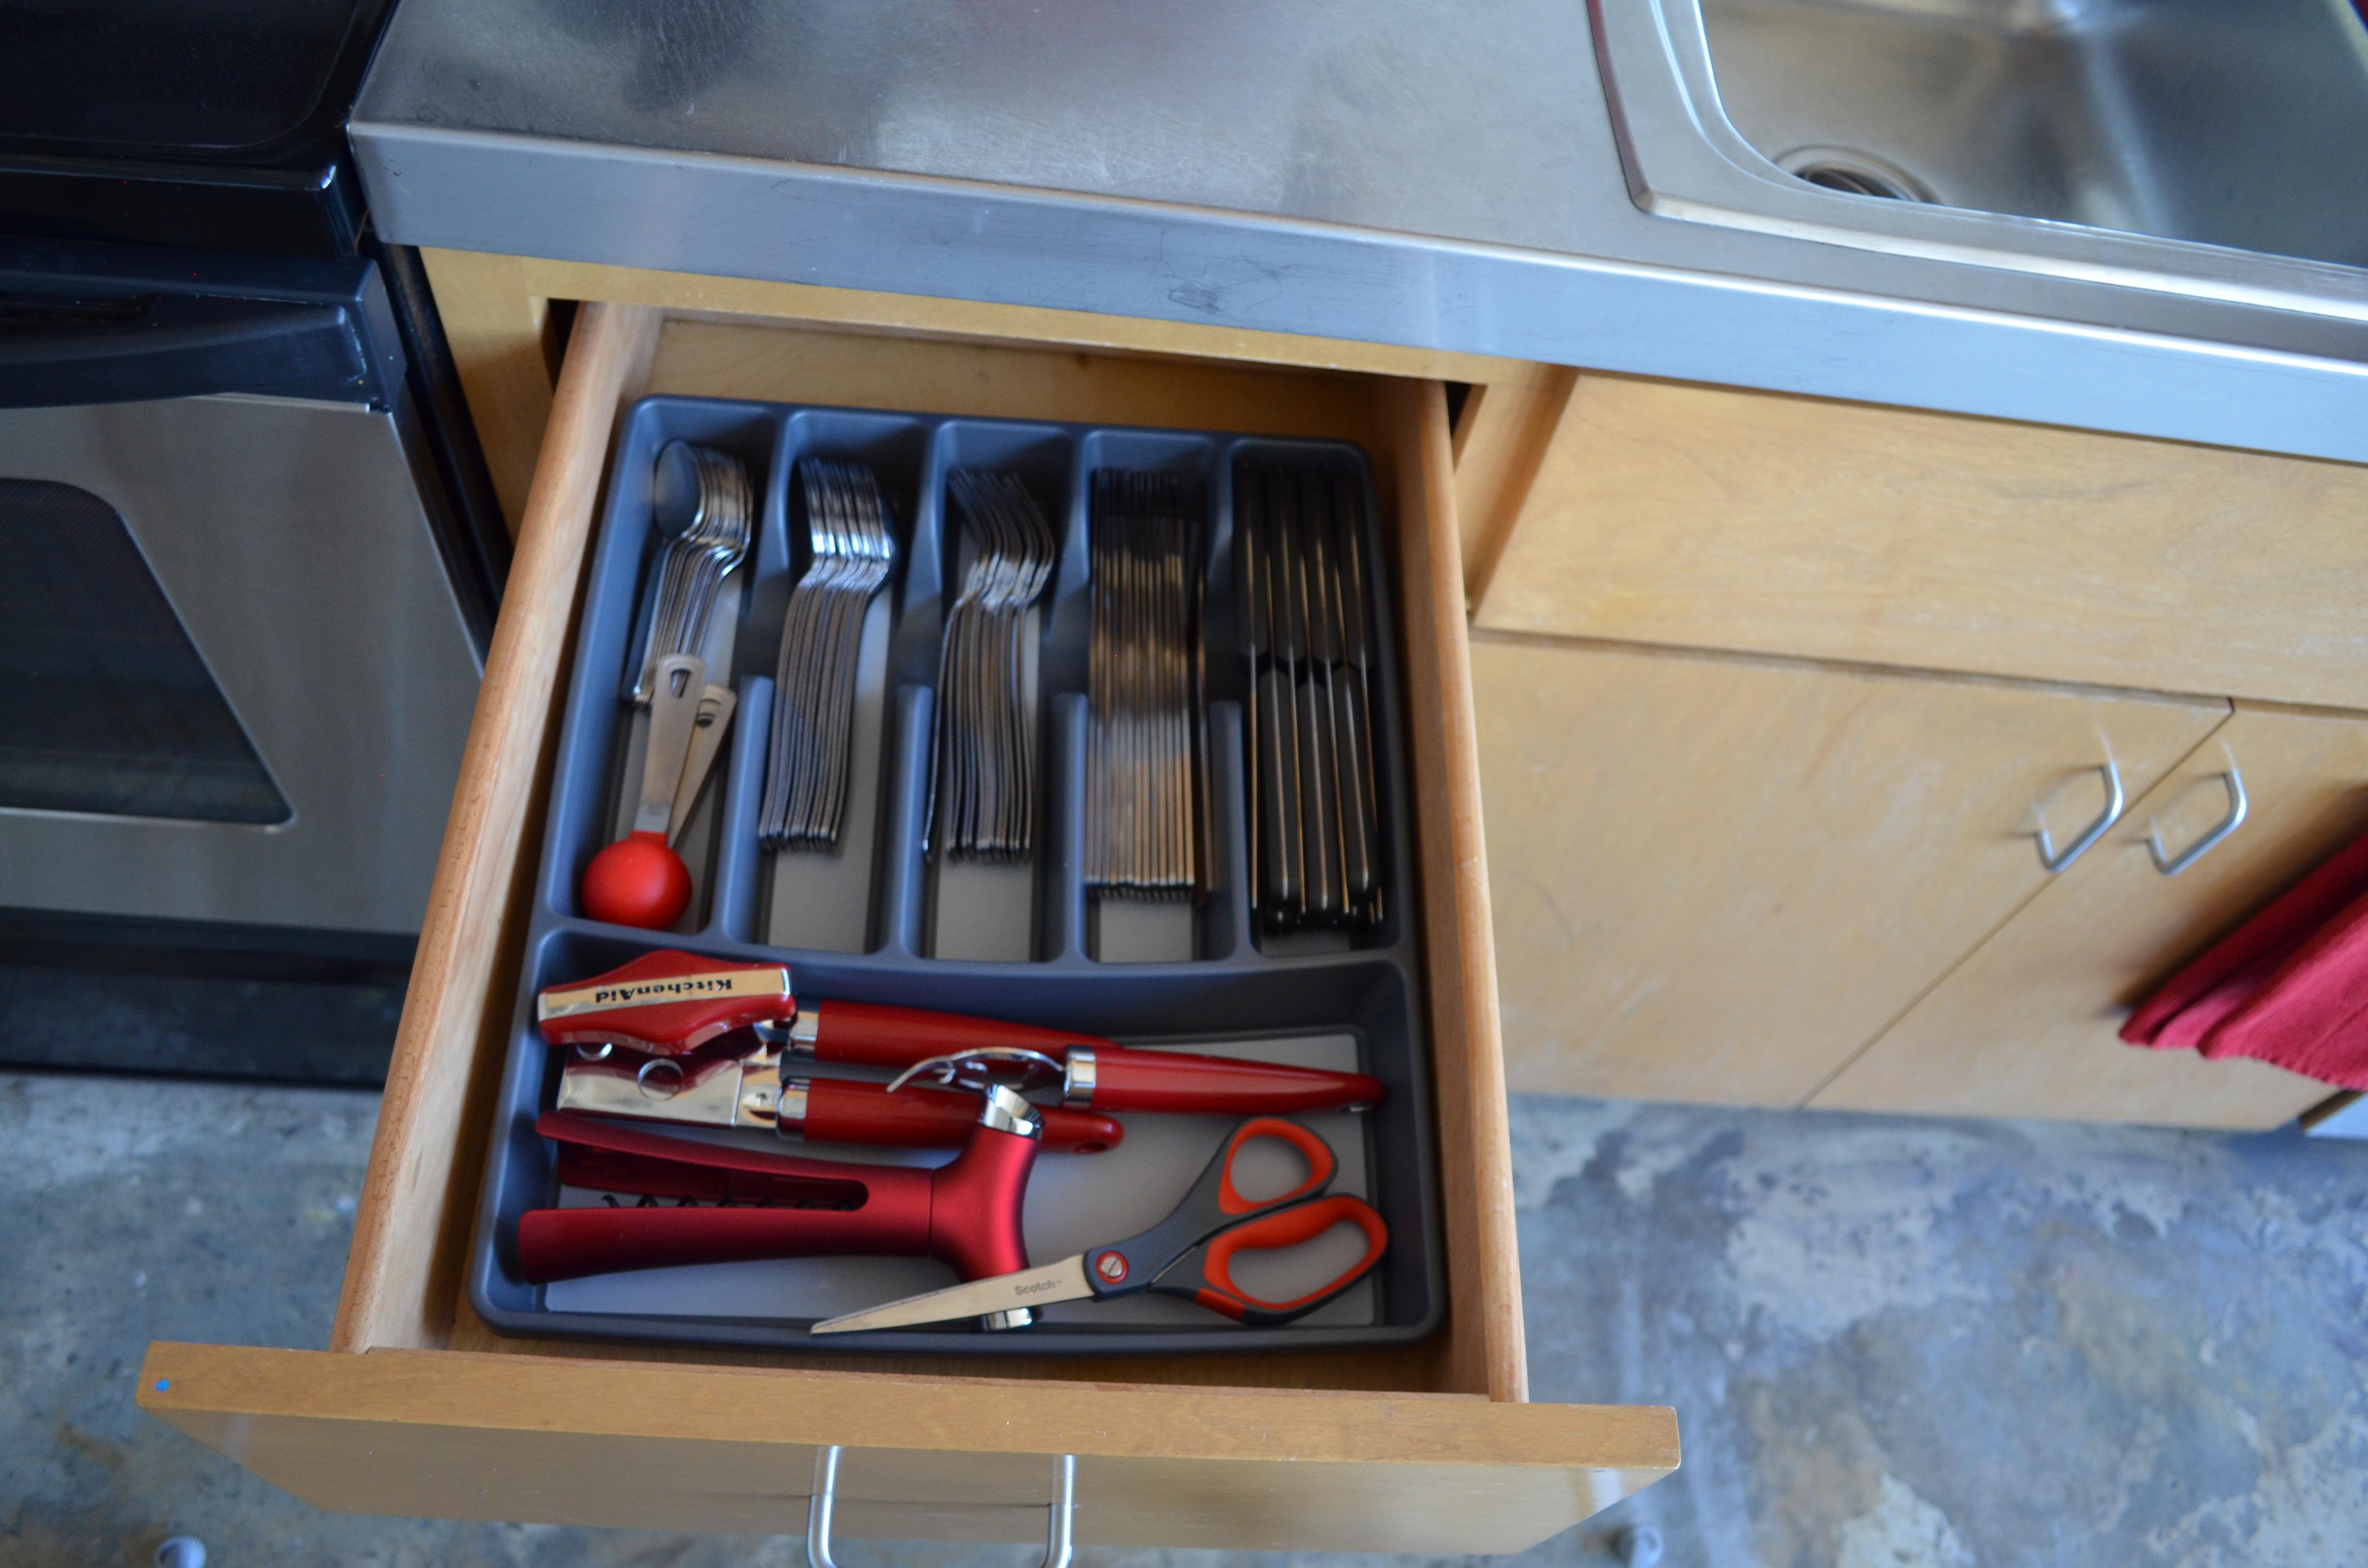 Silverware Can Opener Bottle Opener Kitchen - Loft Reverie Amenities